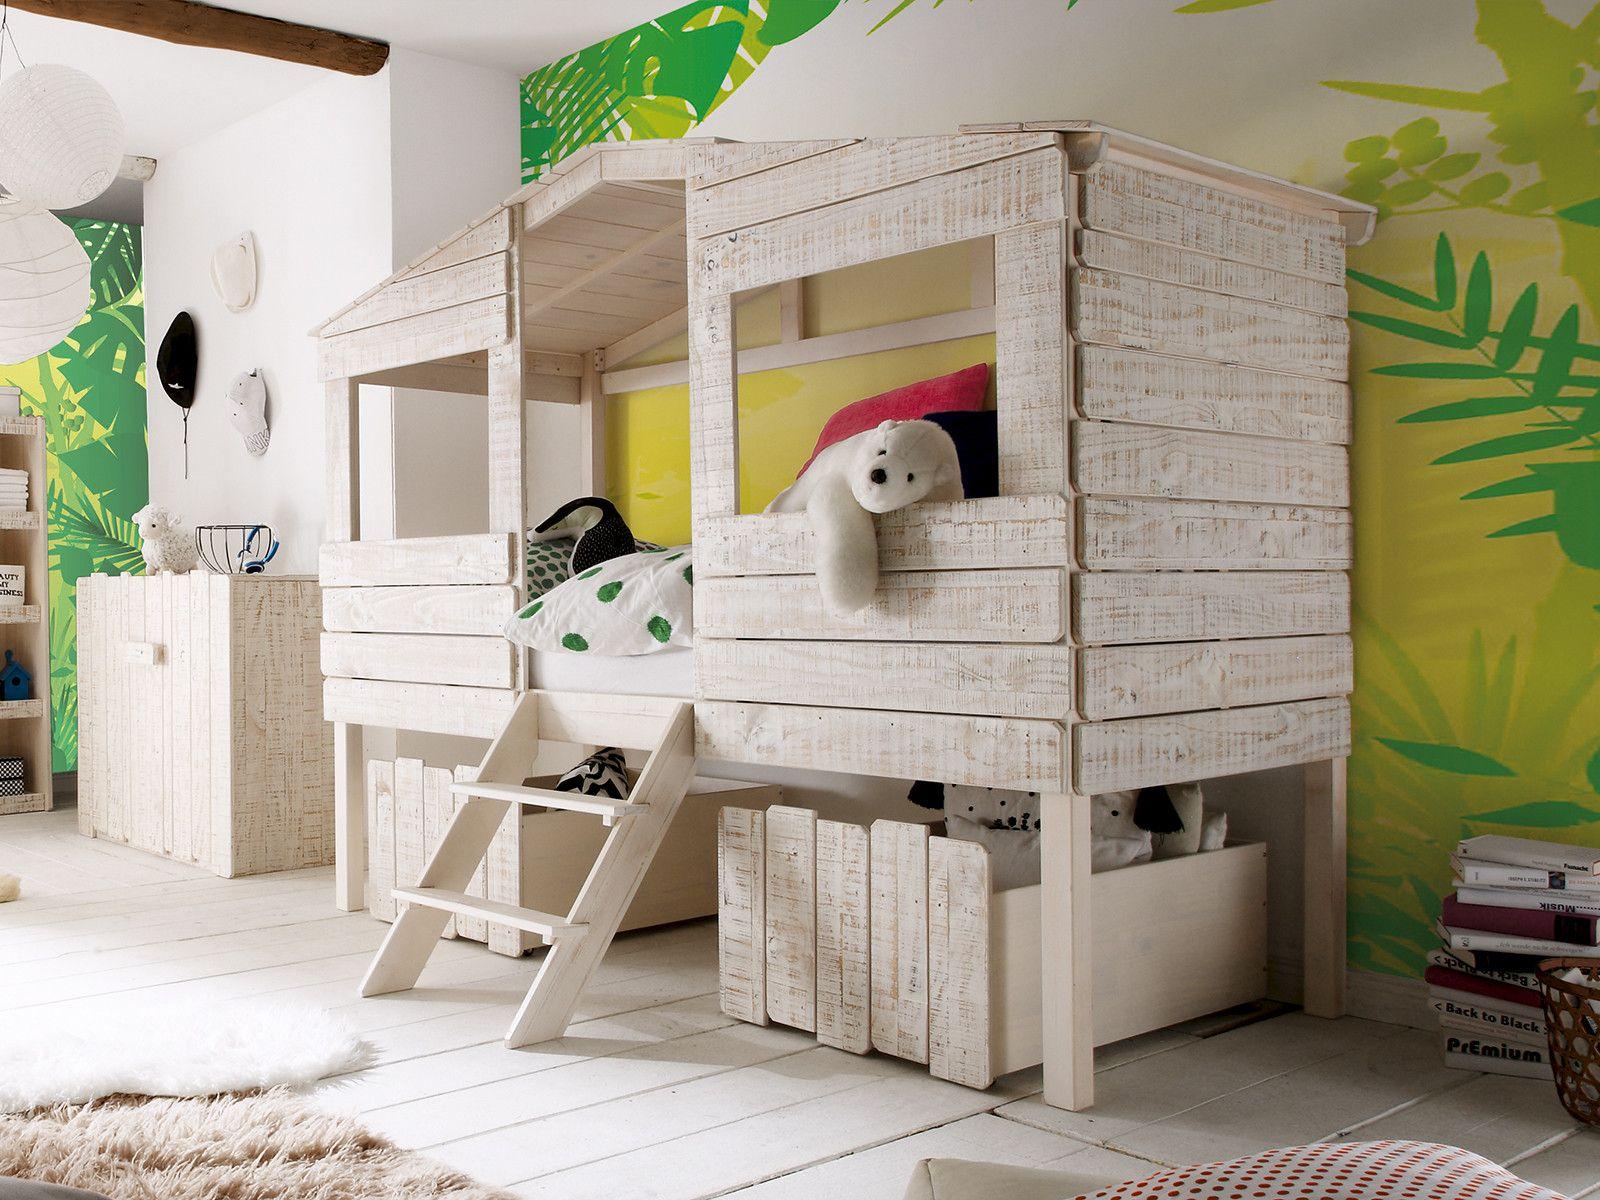 KinderbettSafari Kinder bett, Kinderbett, Bett ideen